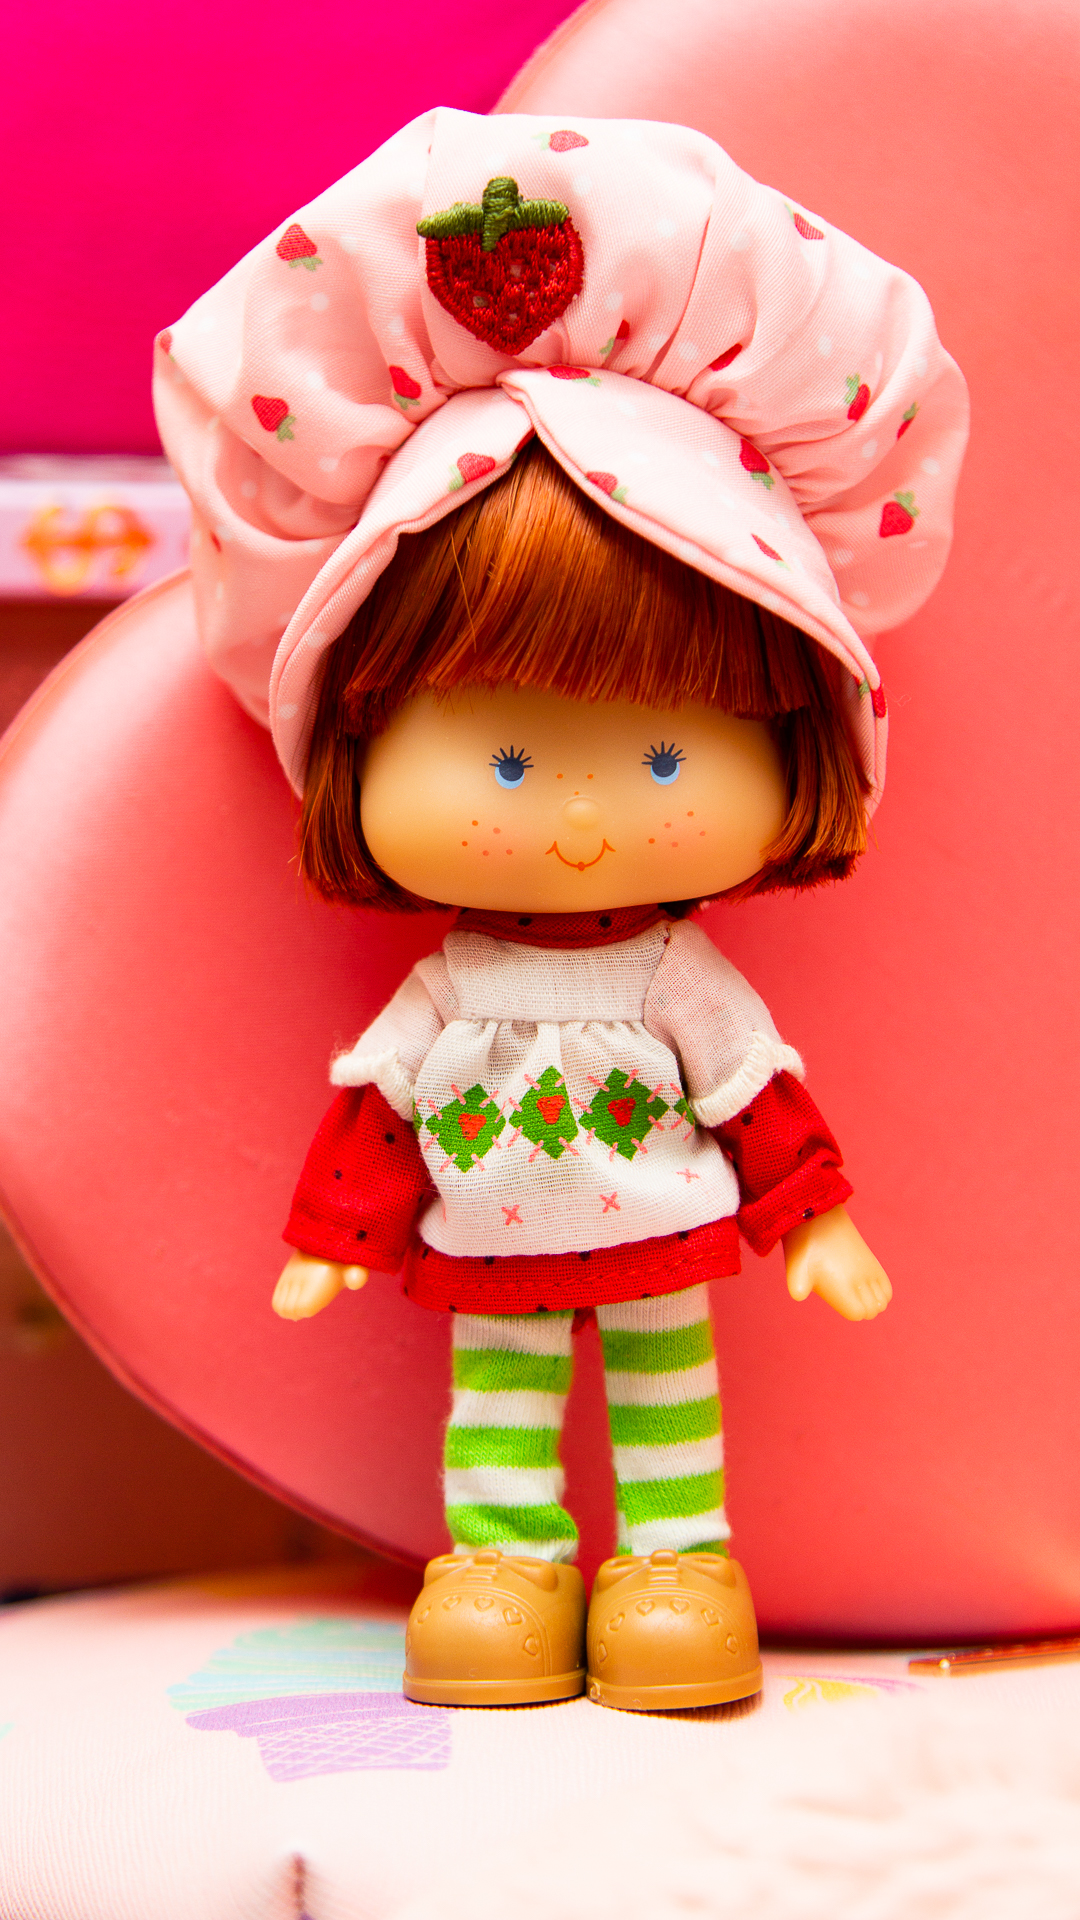 Always-Fits-Strawberry-Shortcake-Doll-2-1.jpg